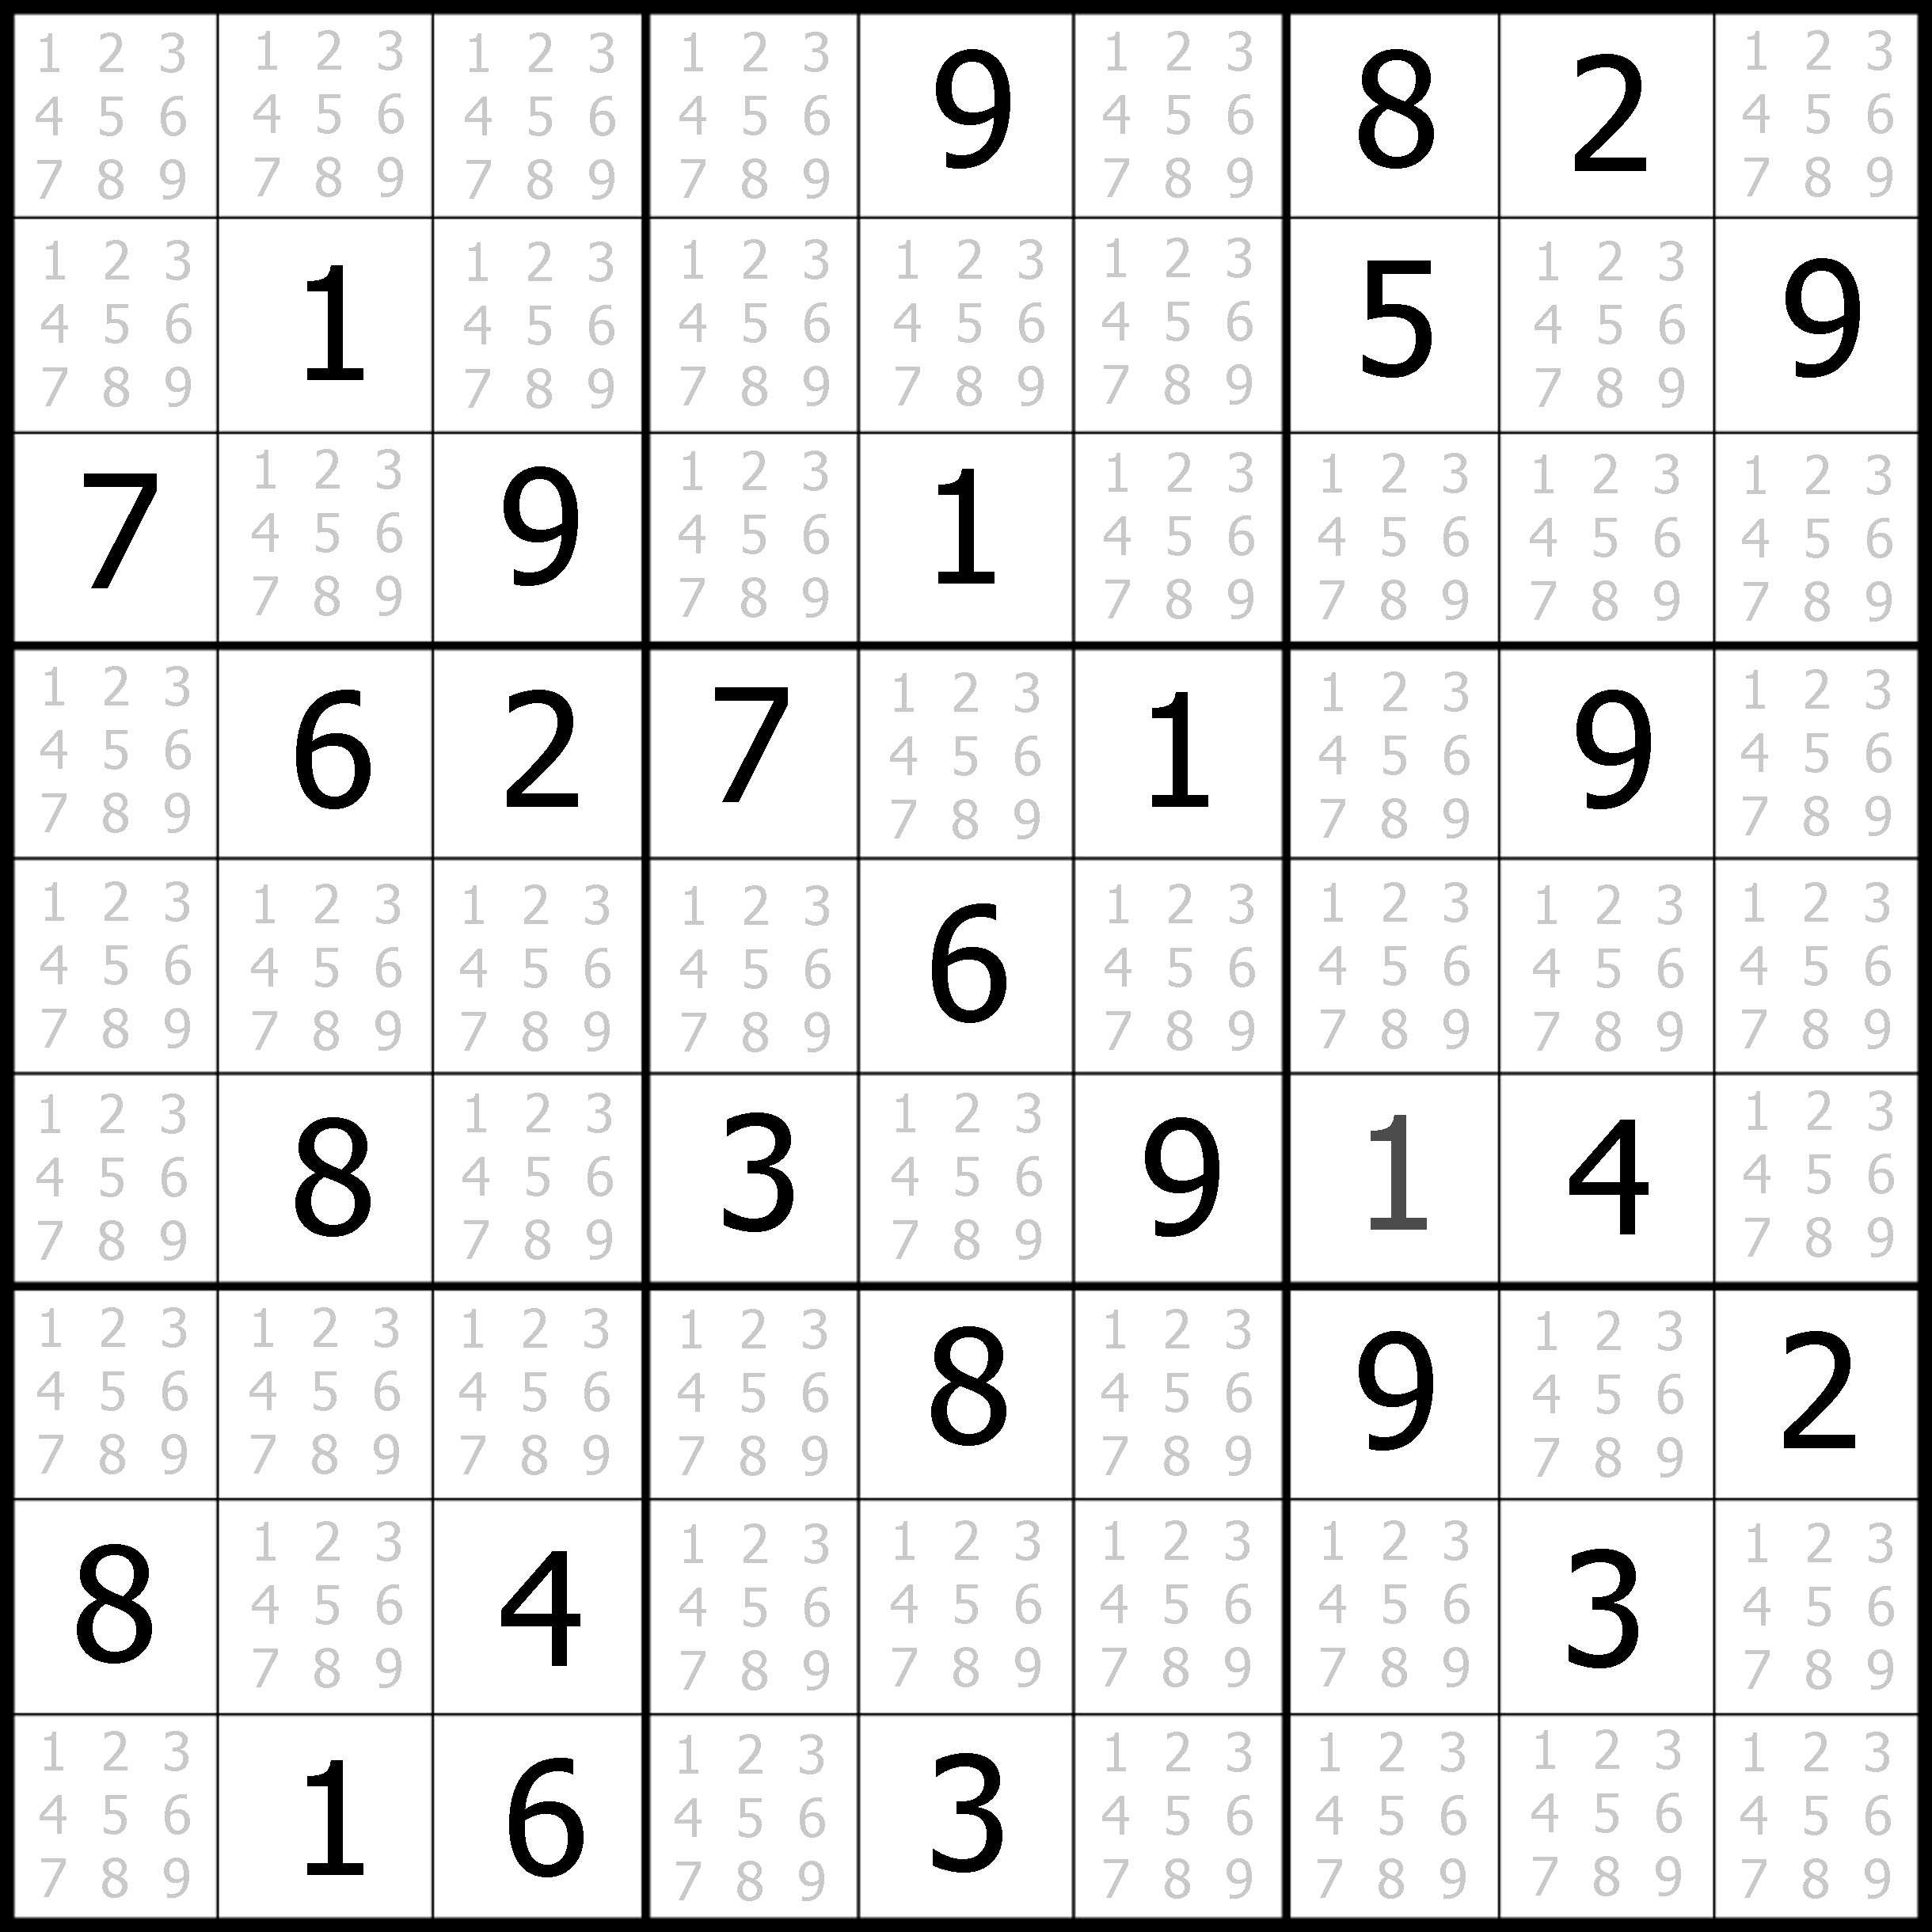 Sudoku Puzzler | Free, Printable, Updated Sudoku Puzzles With A - Printable Sudoku Puzzle Easy